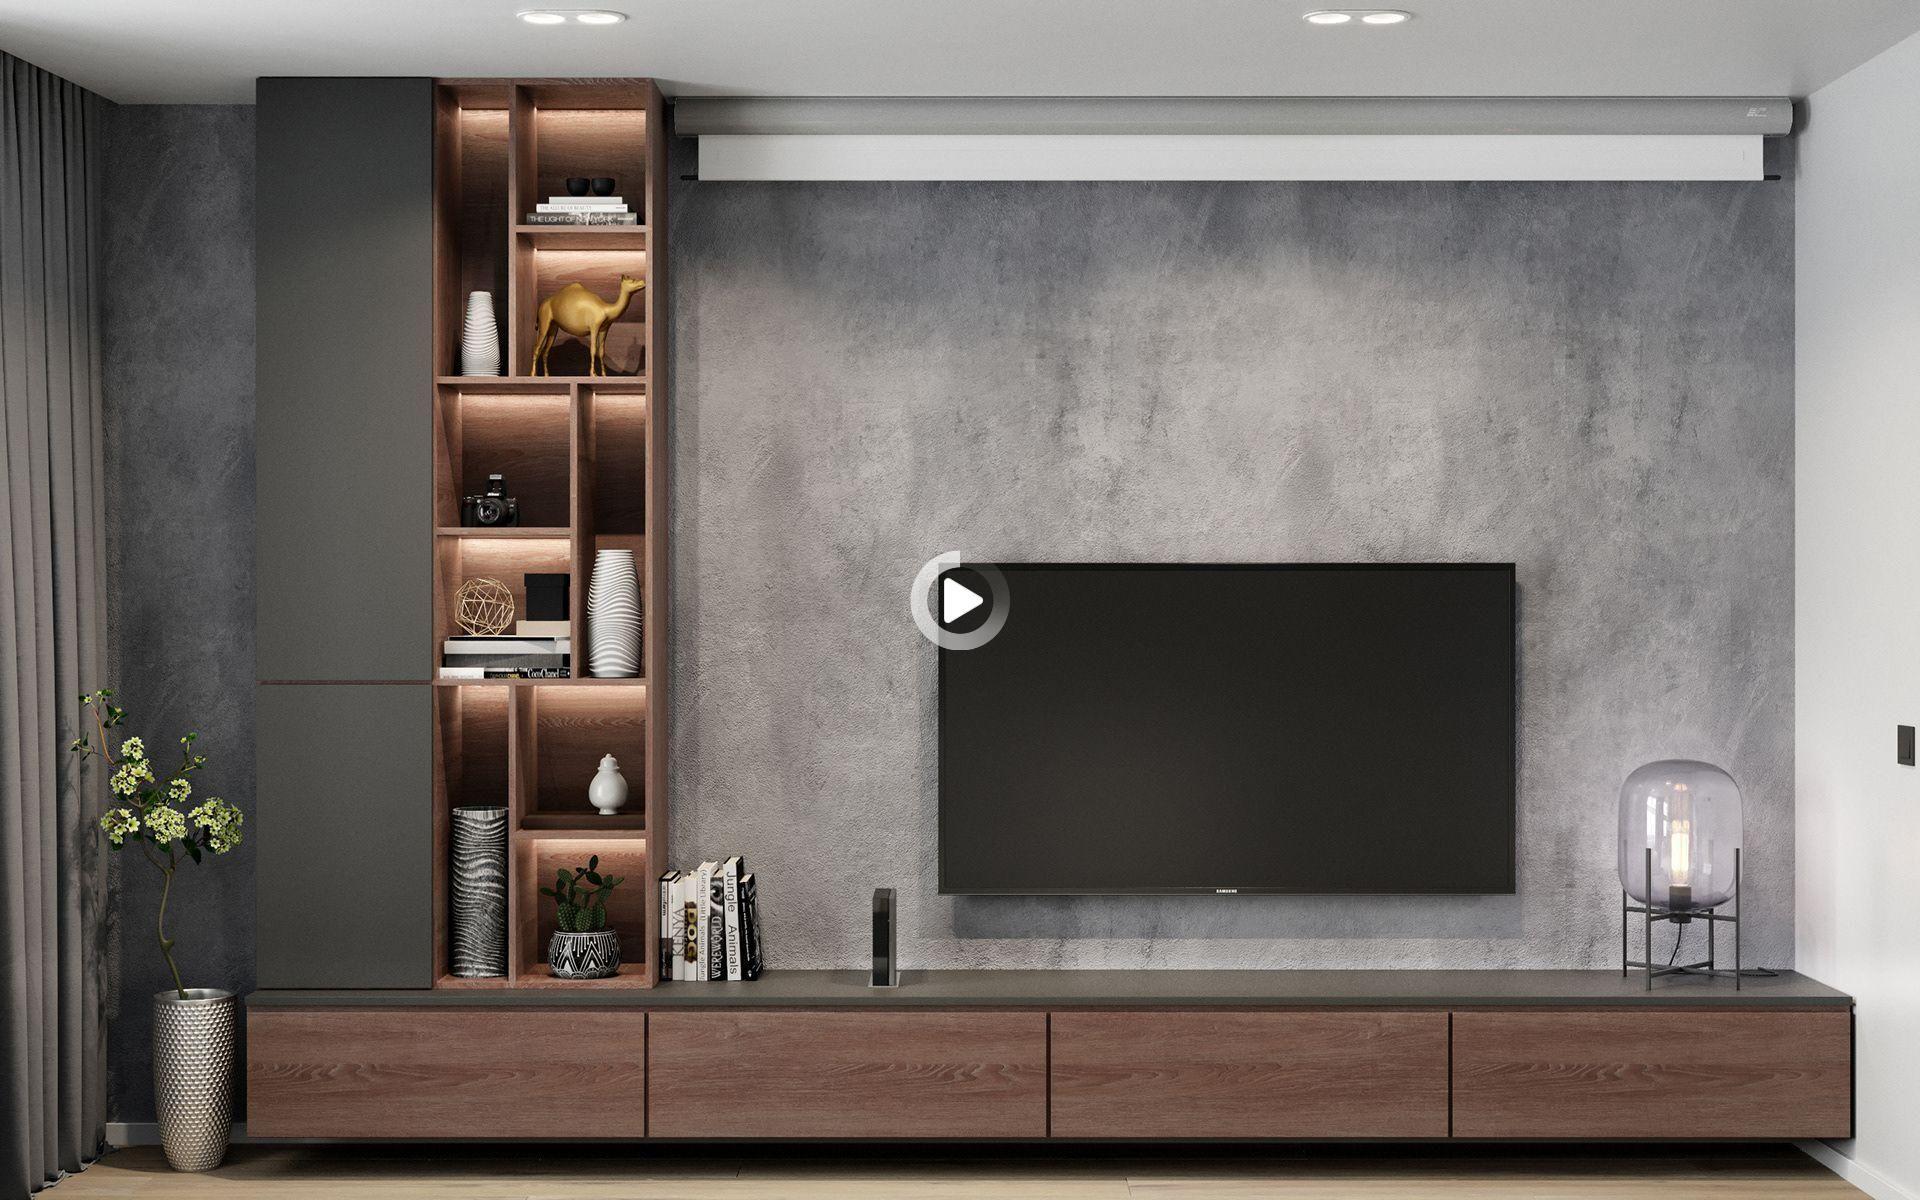 Redirecting In 2021 Modern Tv Room Living Room Design Decor Tv Room Design